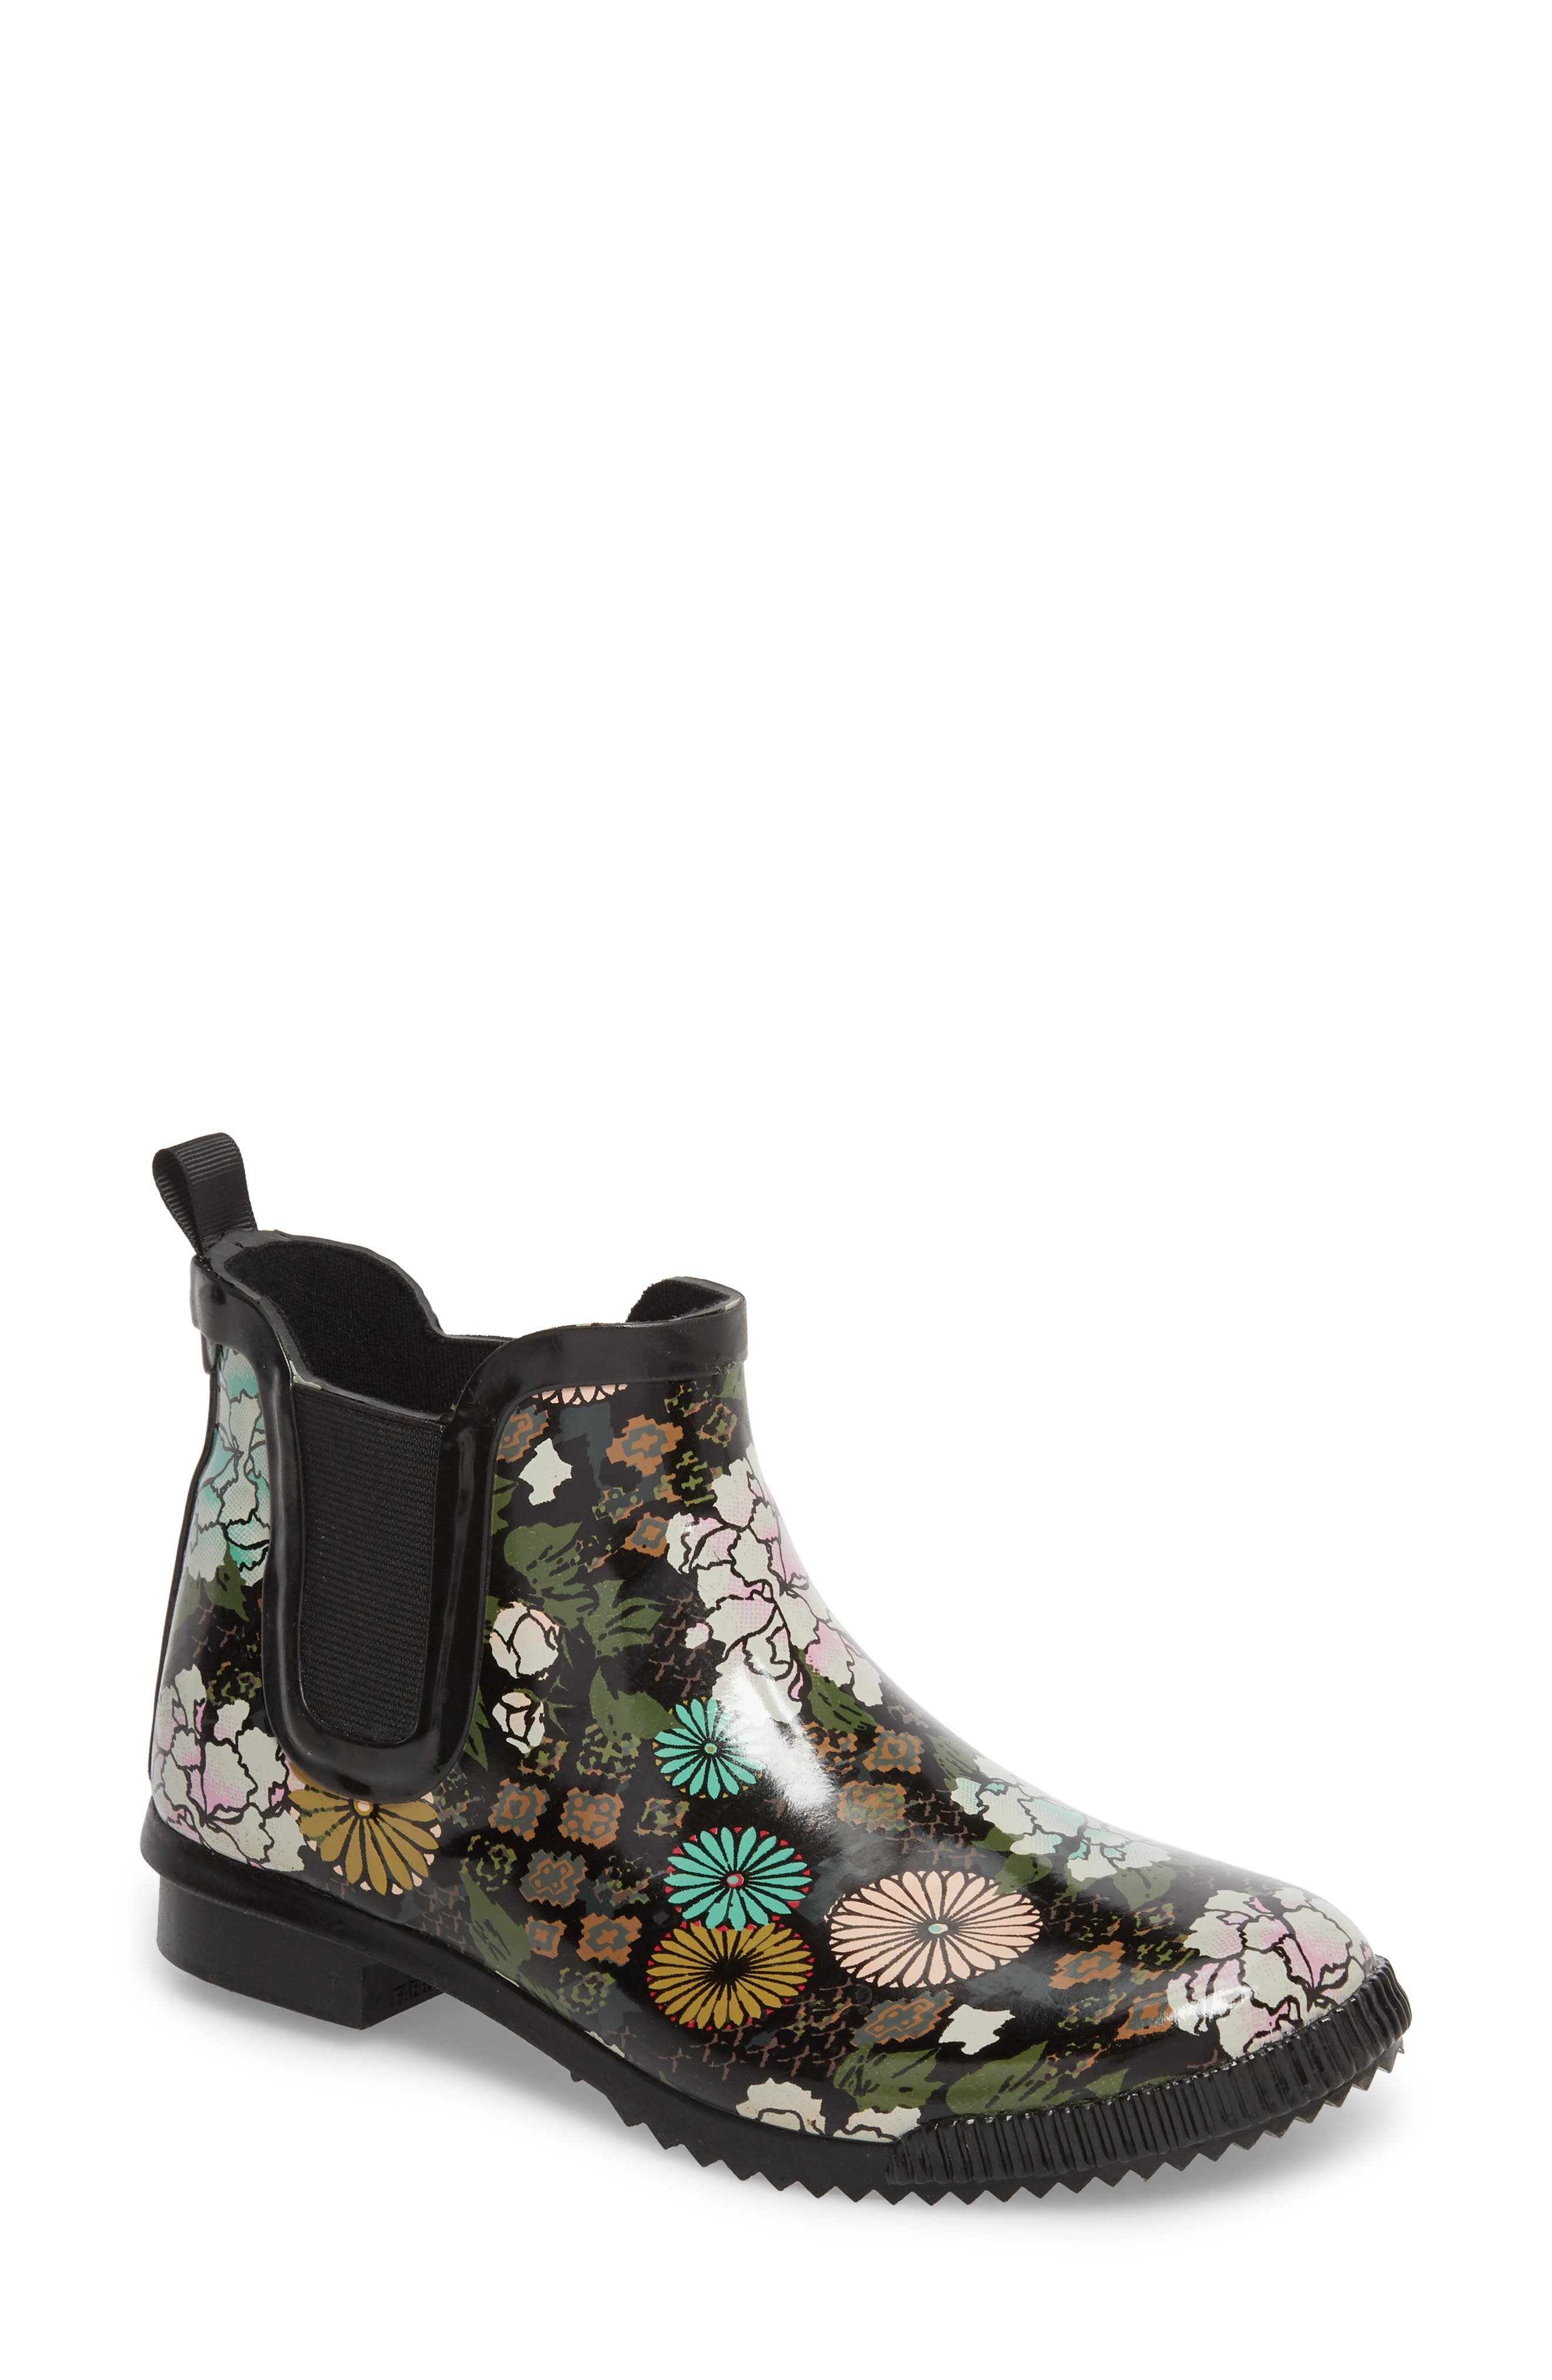 COUGAR Regent Chelsea Waterproof Rain Boot, Main, color, KIMONO